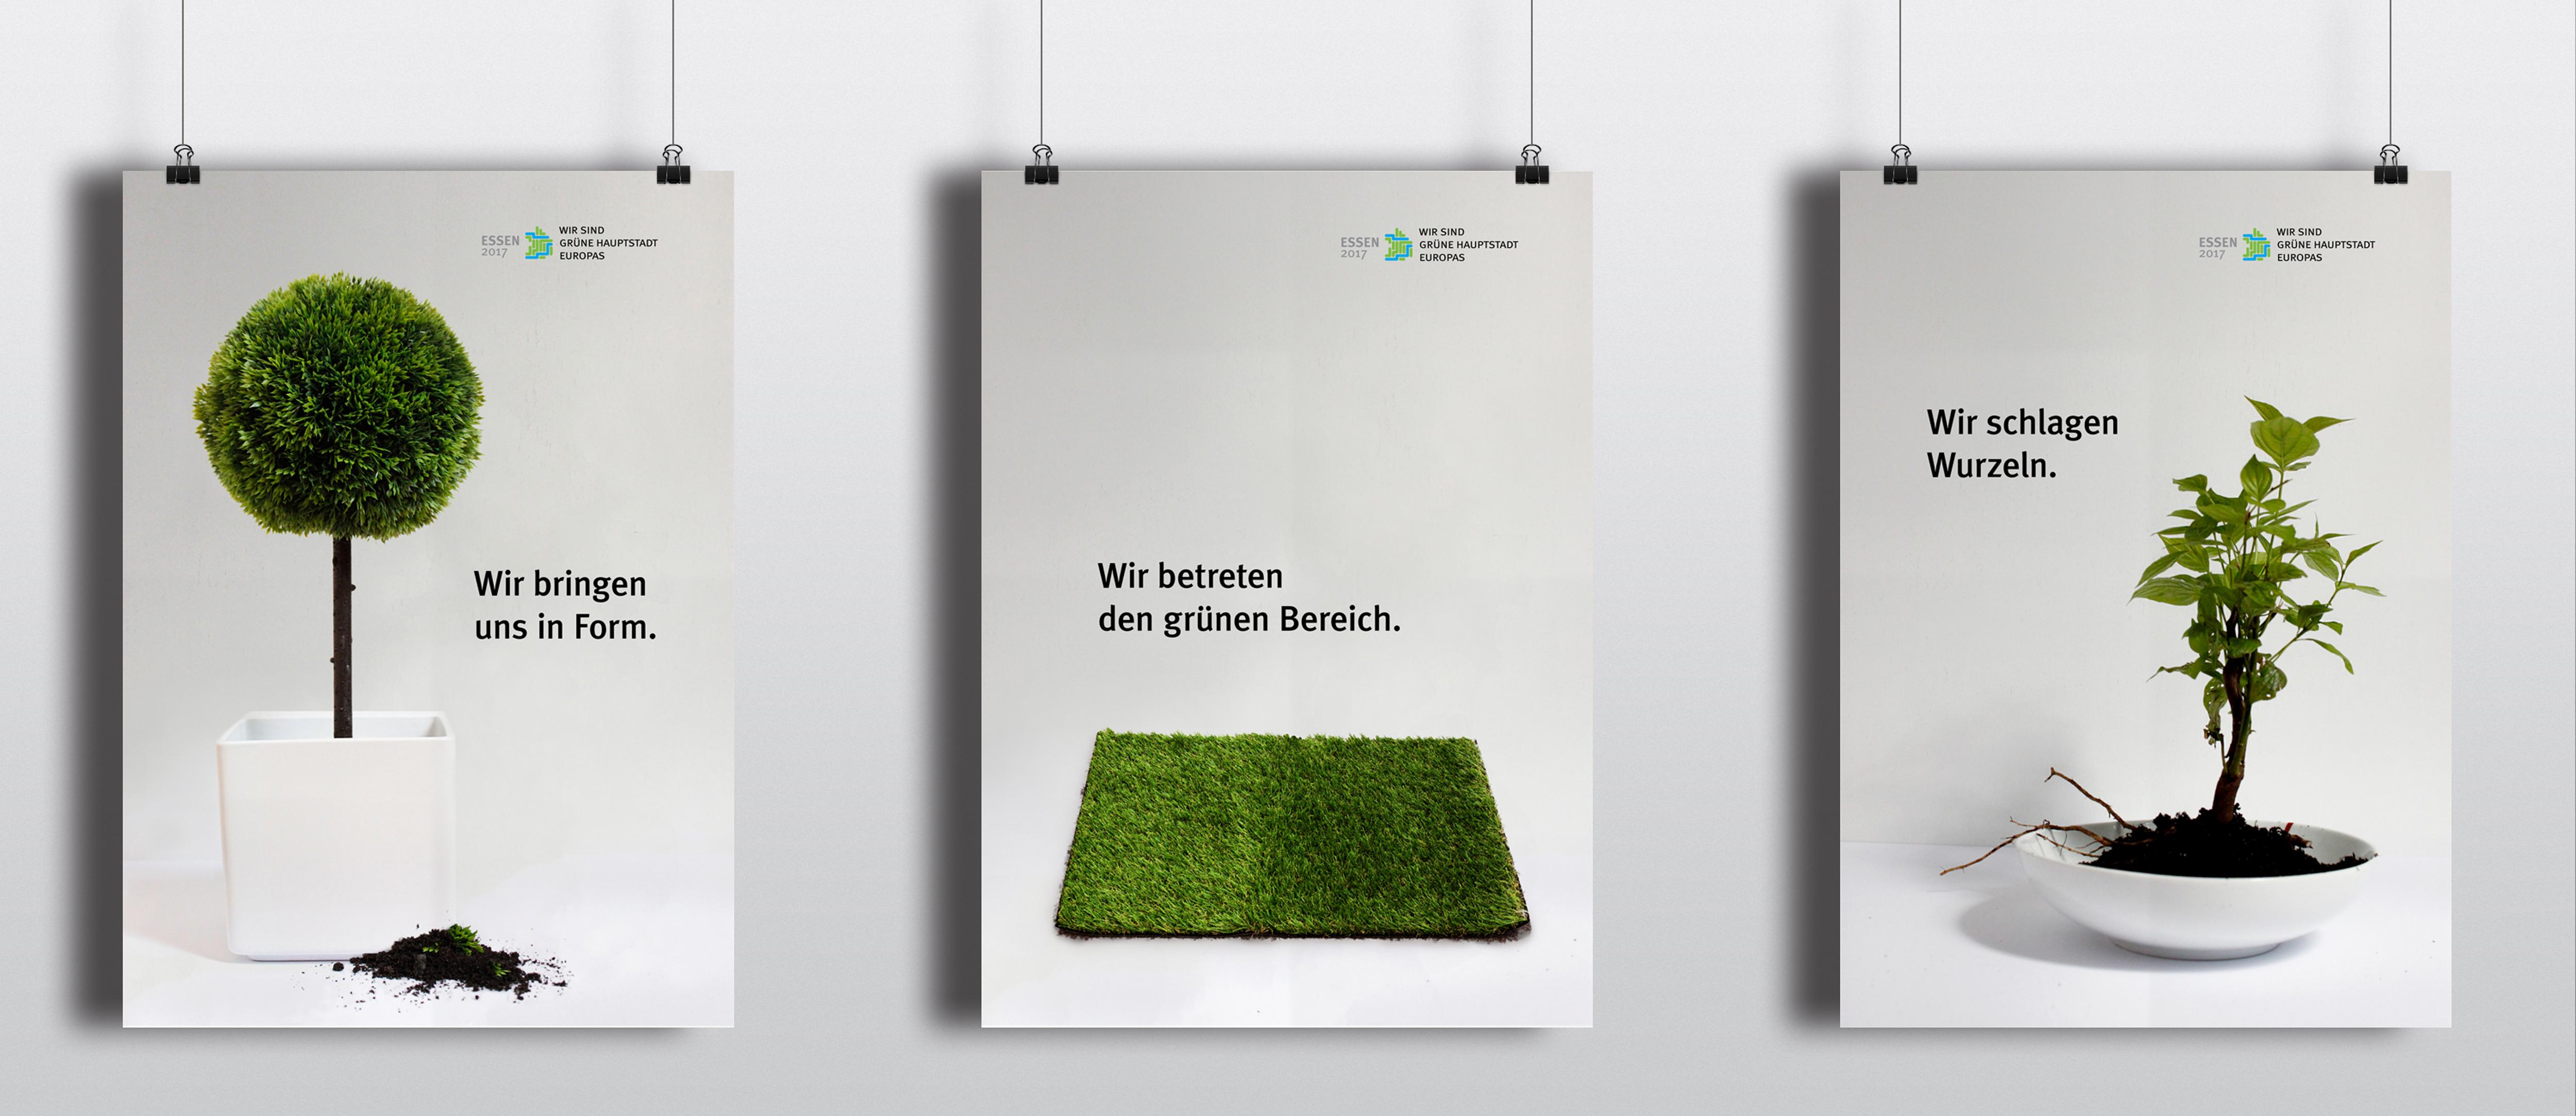 "Plakatwettbewerb - ""Grüne Hauptstadt Europas"" - 2017"